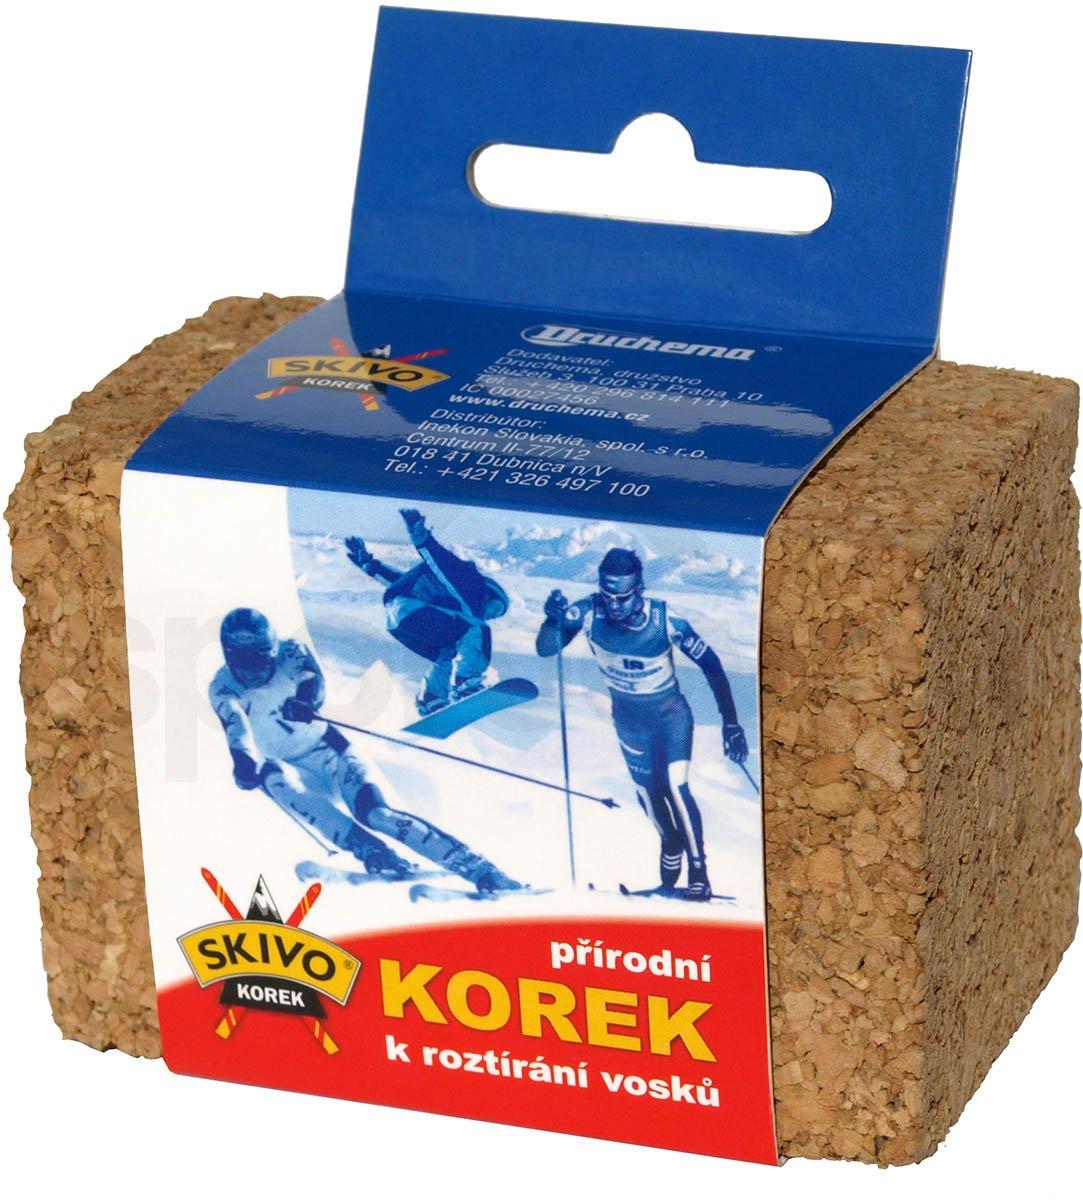 skivo-korek_0